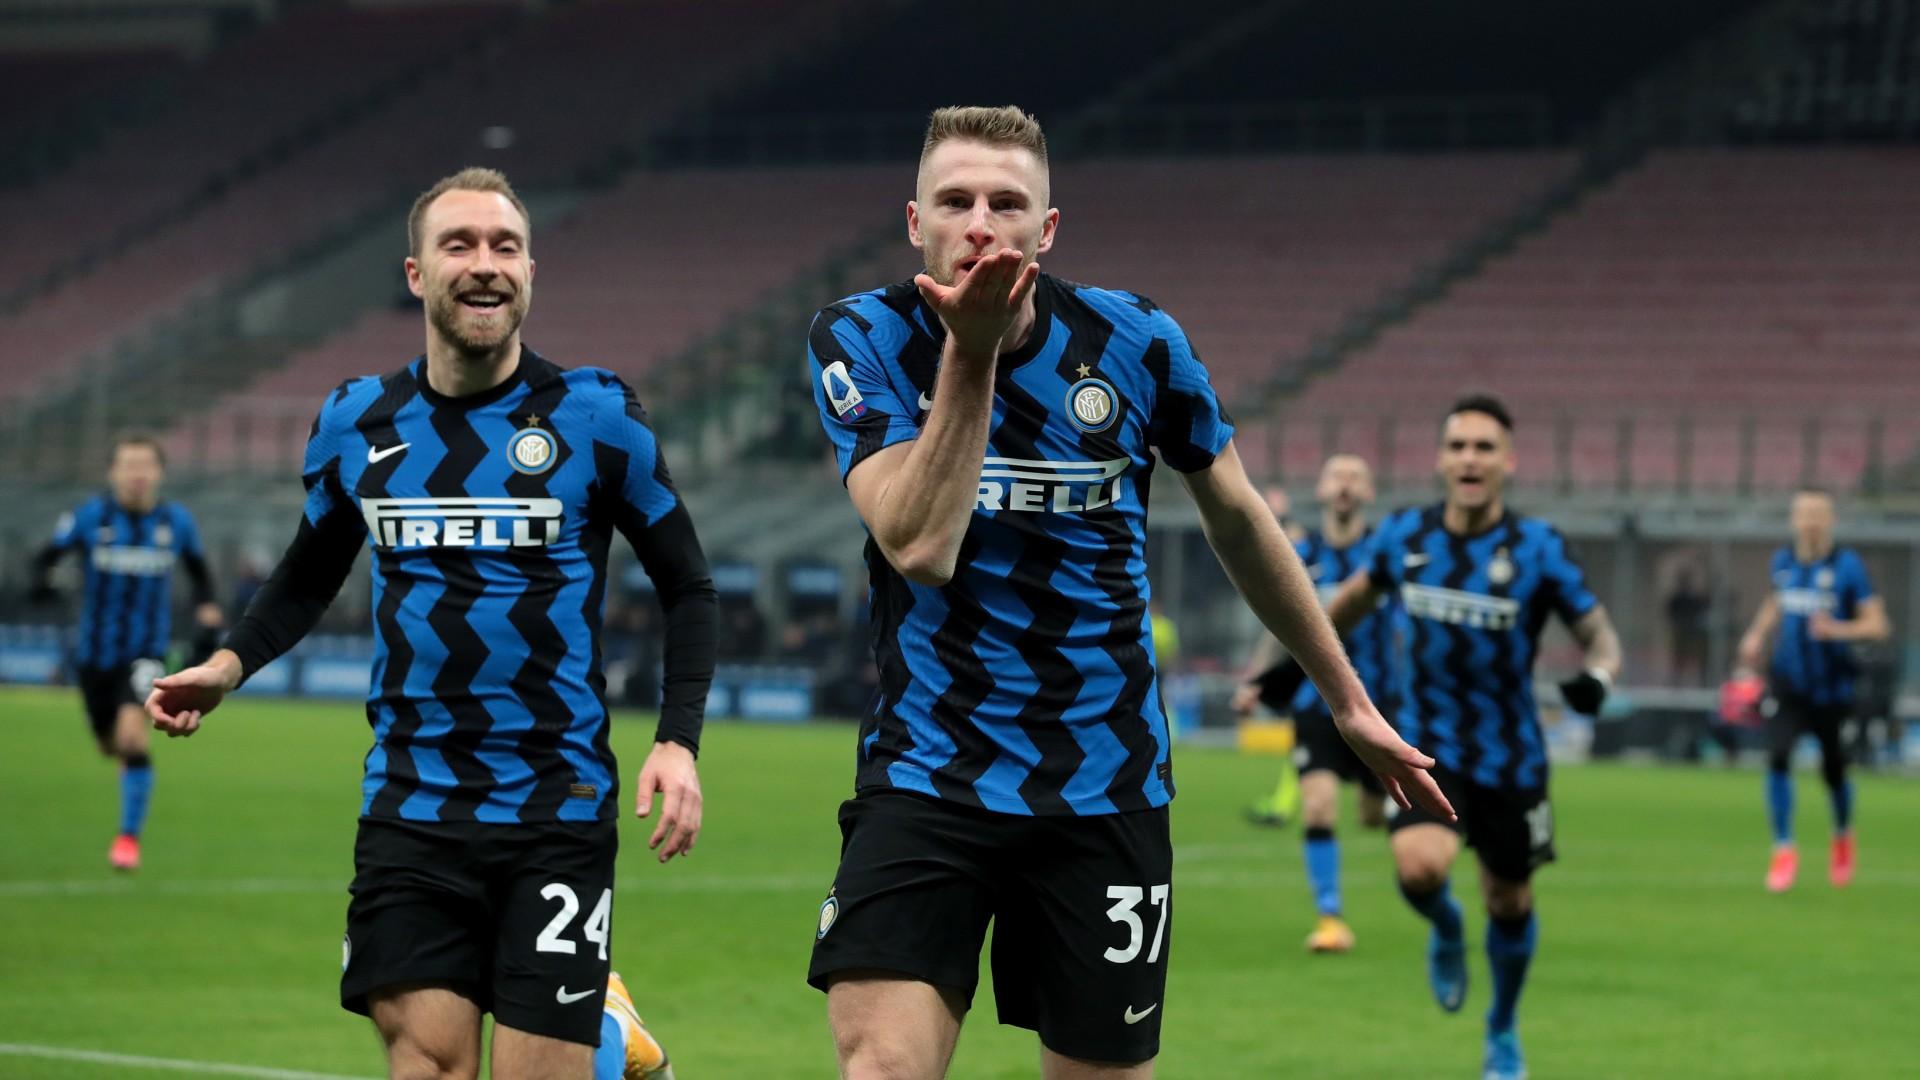 Inter 1-0 Atalanta: Skriniar strikes to lift Serie A leaders clear